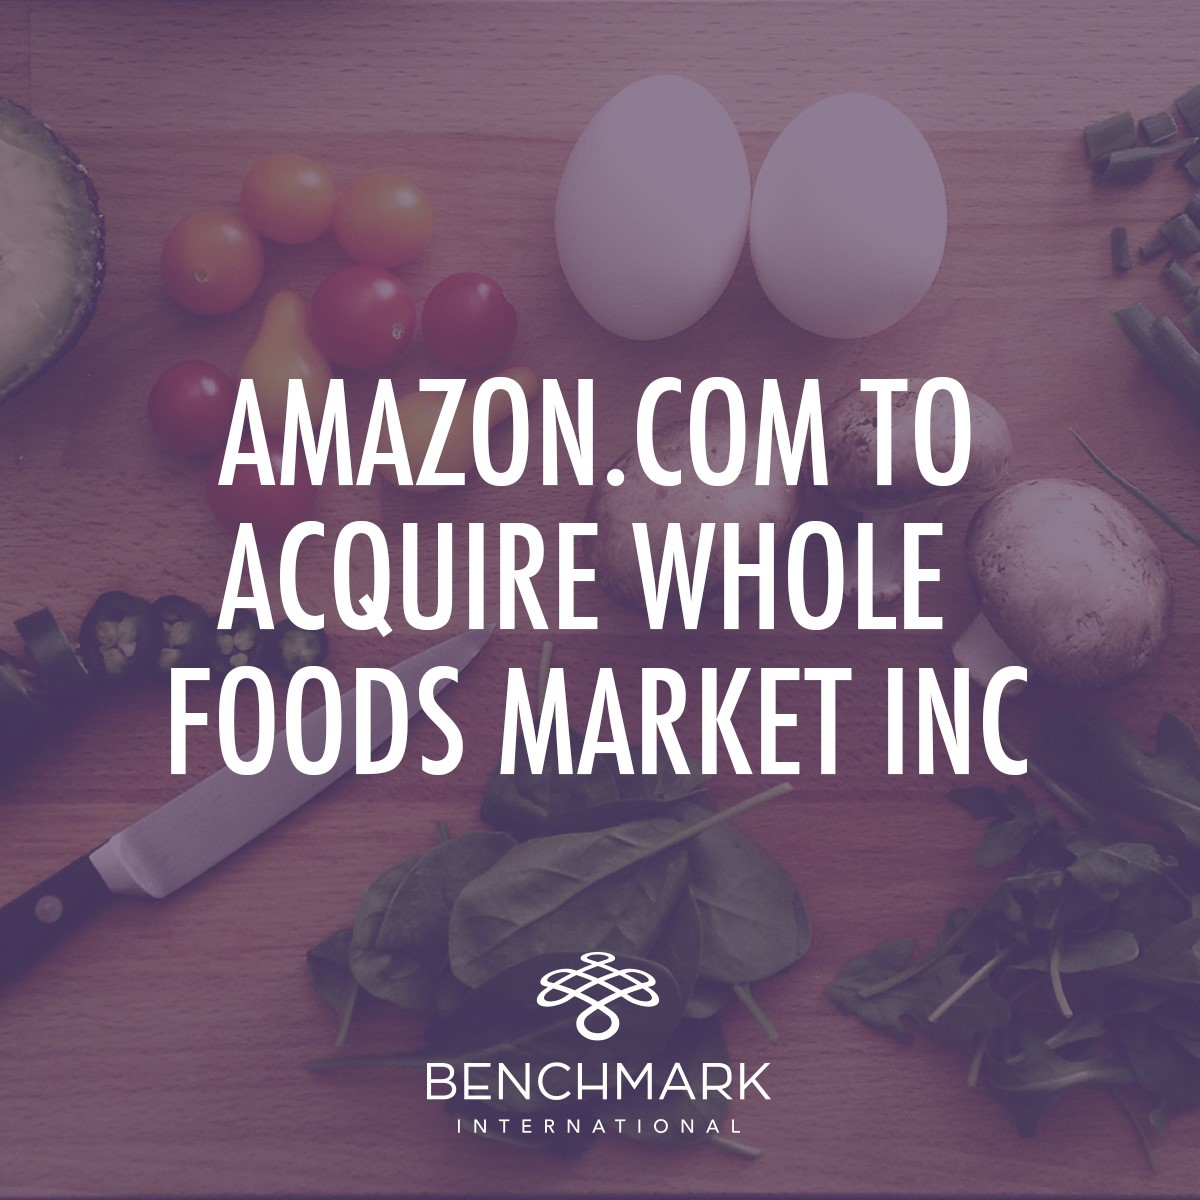 Amazon.com to acquire Whole Foods Market Inc